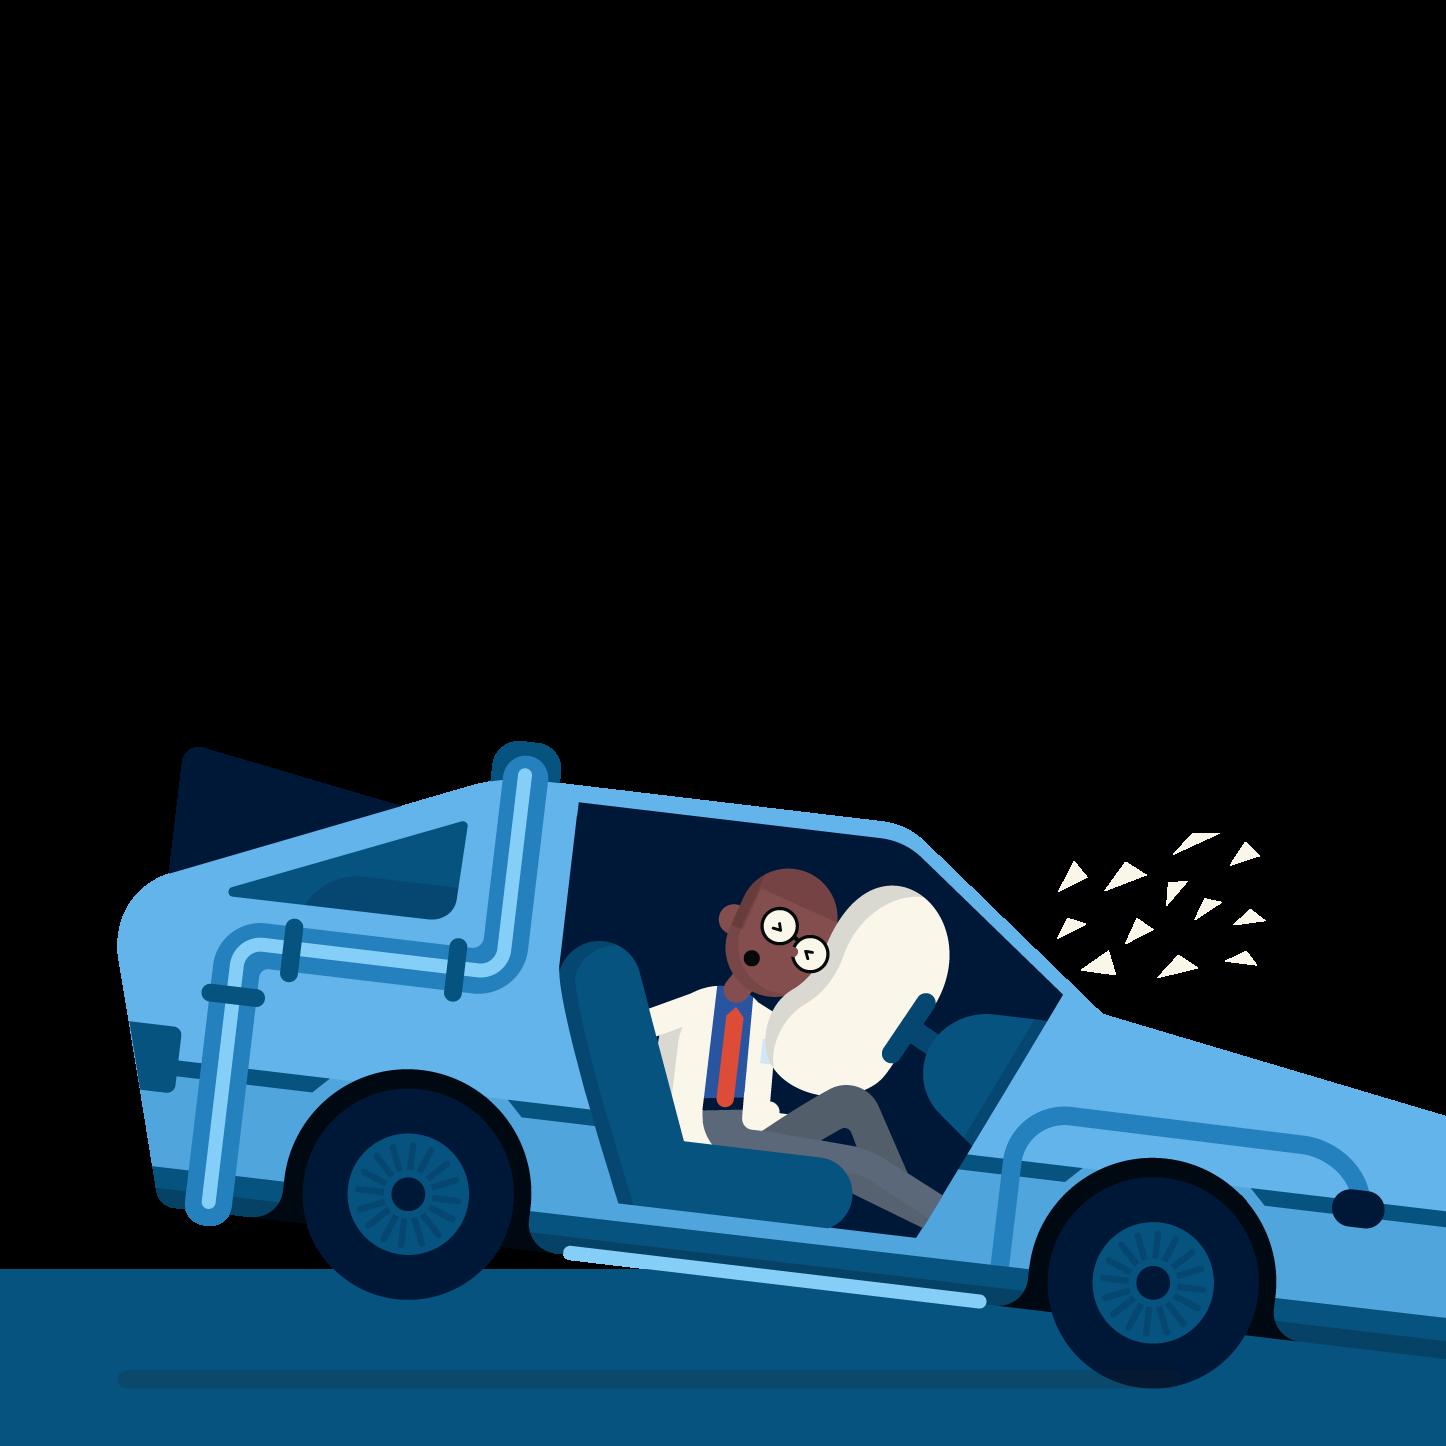 professor crashing an experimental car